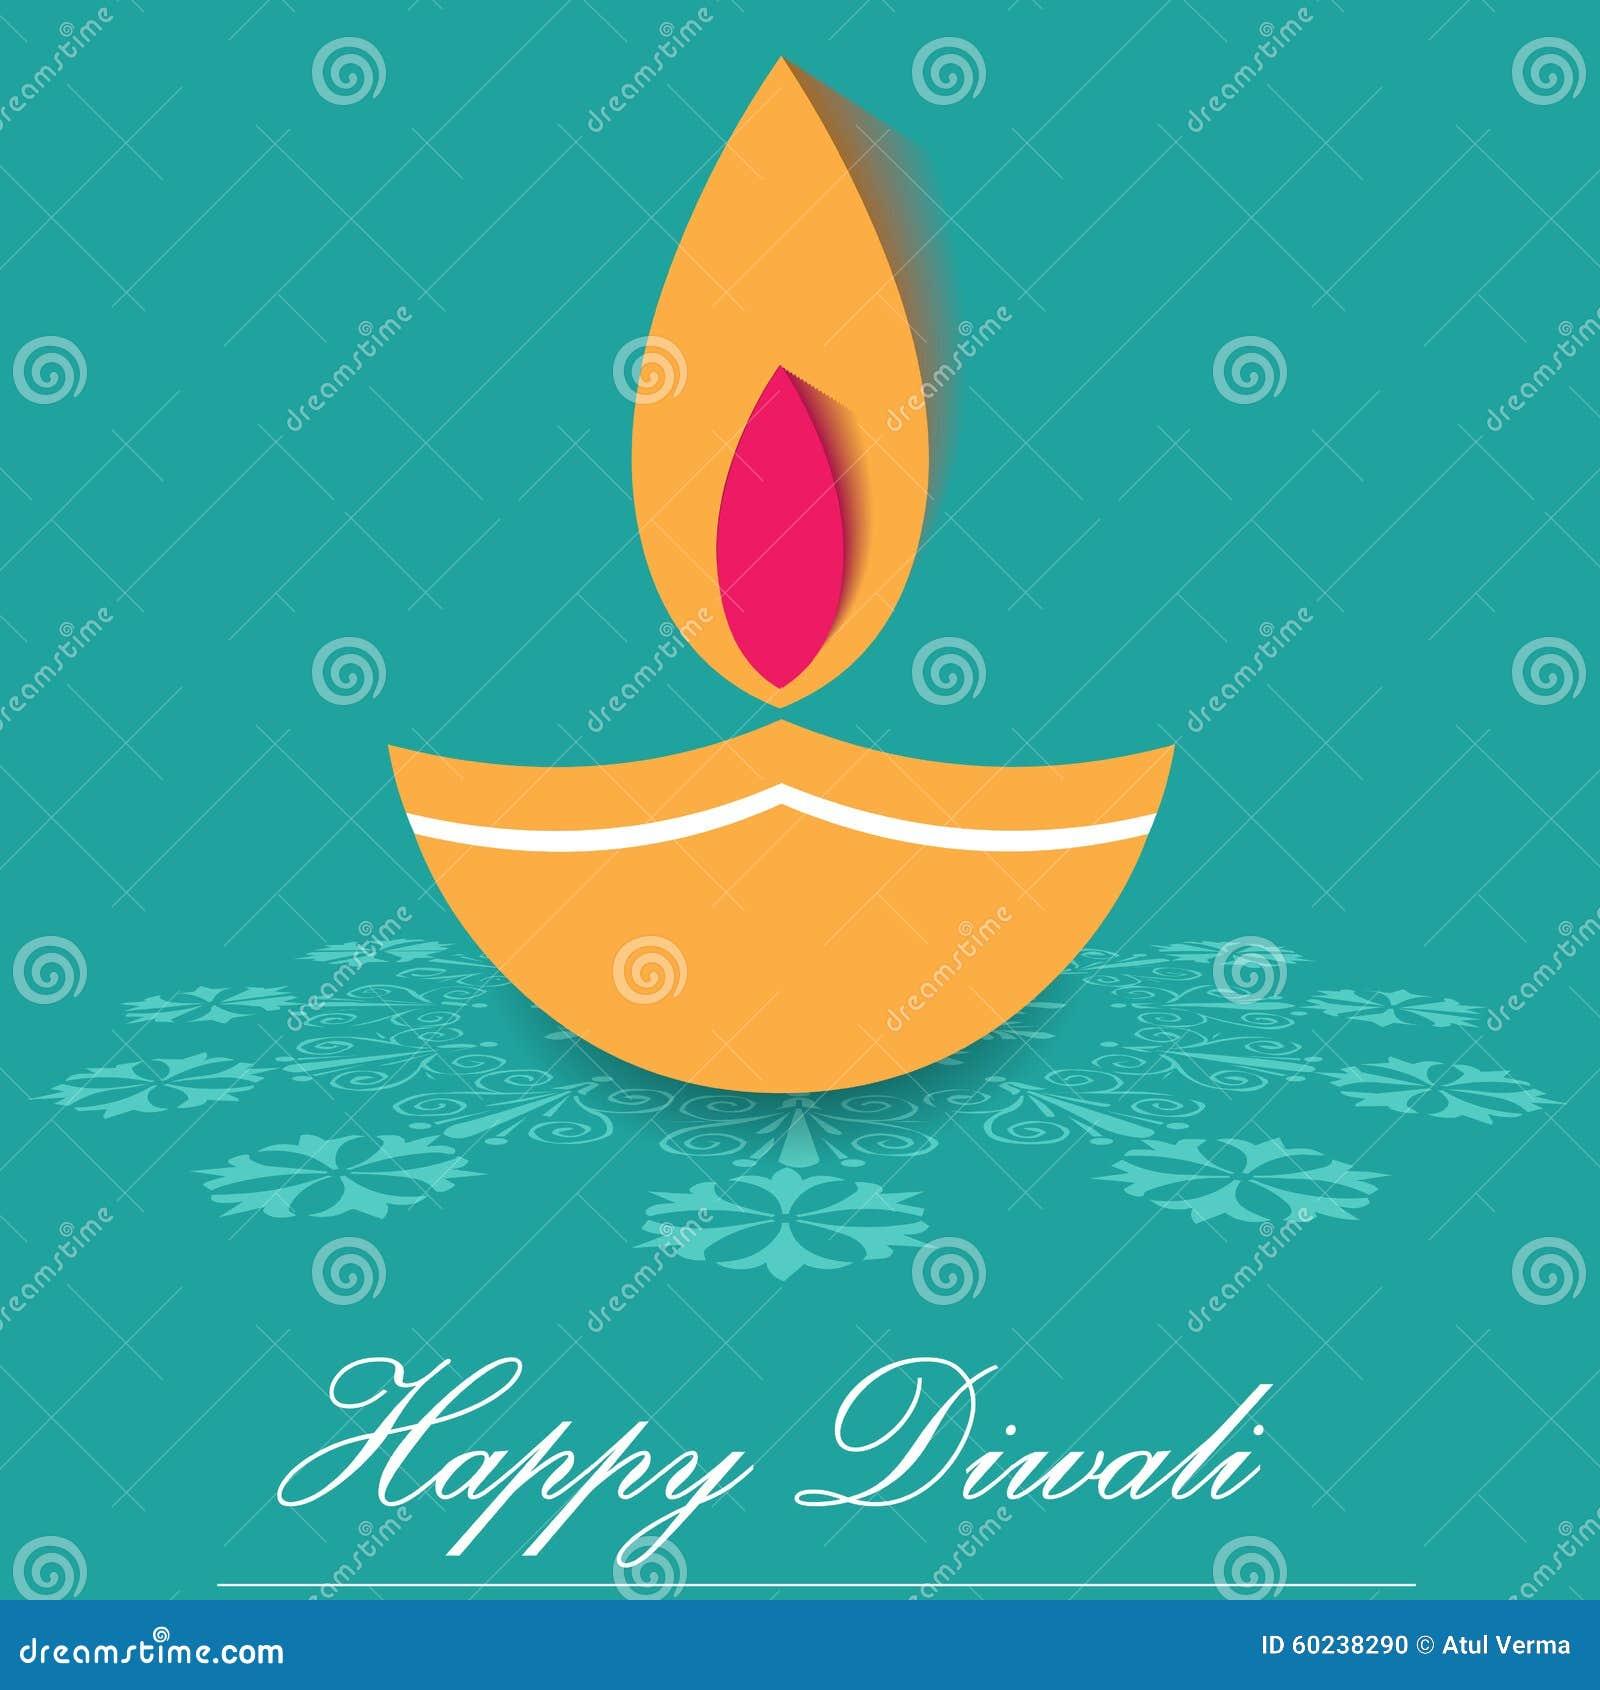 Decorative Diwali Lamps Happy Diwali Greeting Card Flat Design